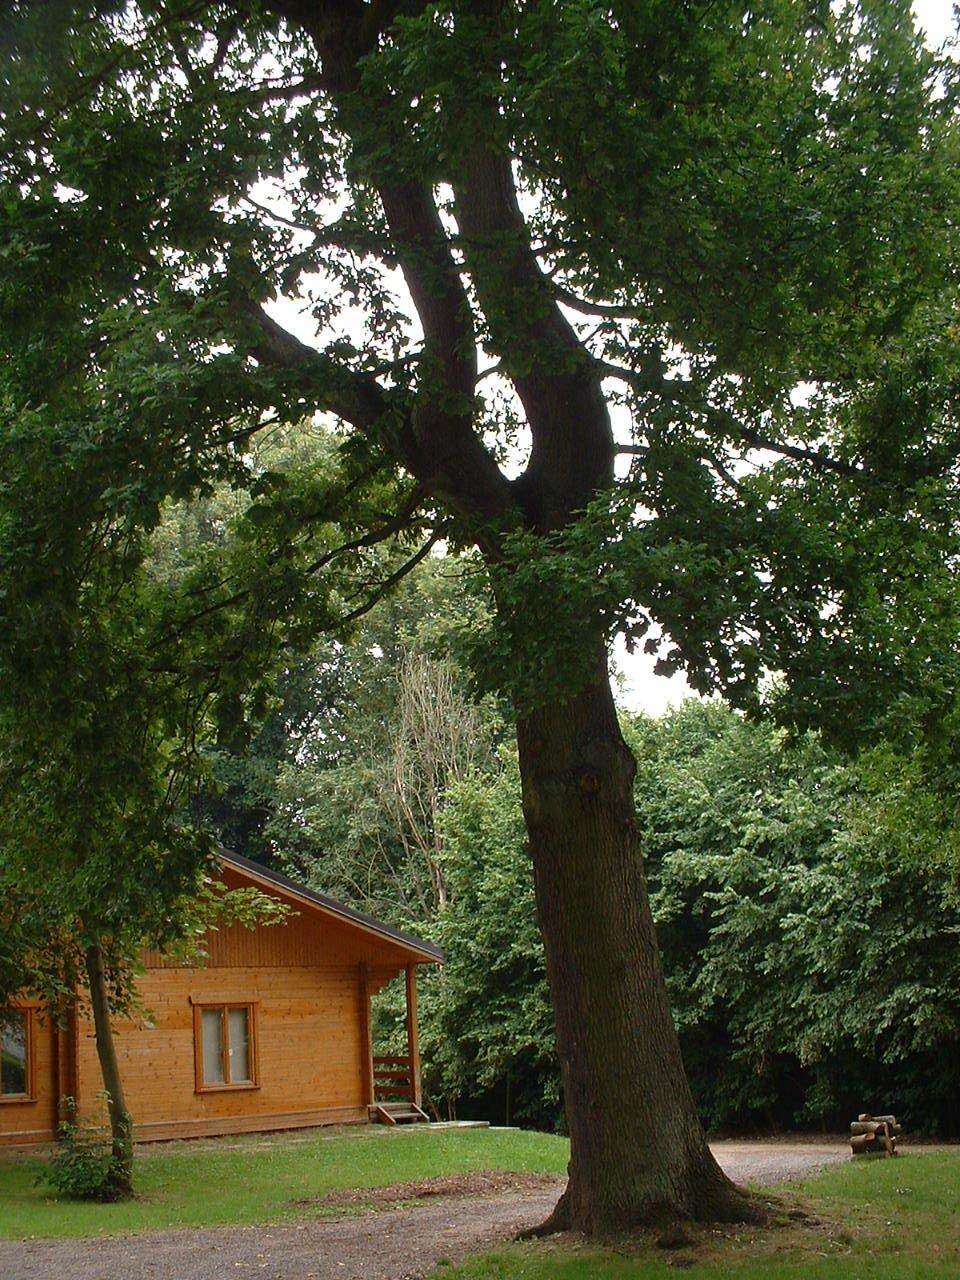 Chêne pédonculé – Watermael-Boitsfort, Parc du château Bischoffsheim, Avenue Van Kerm –  26 Juillet 2002